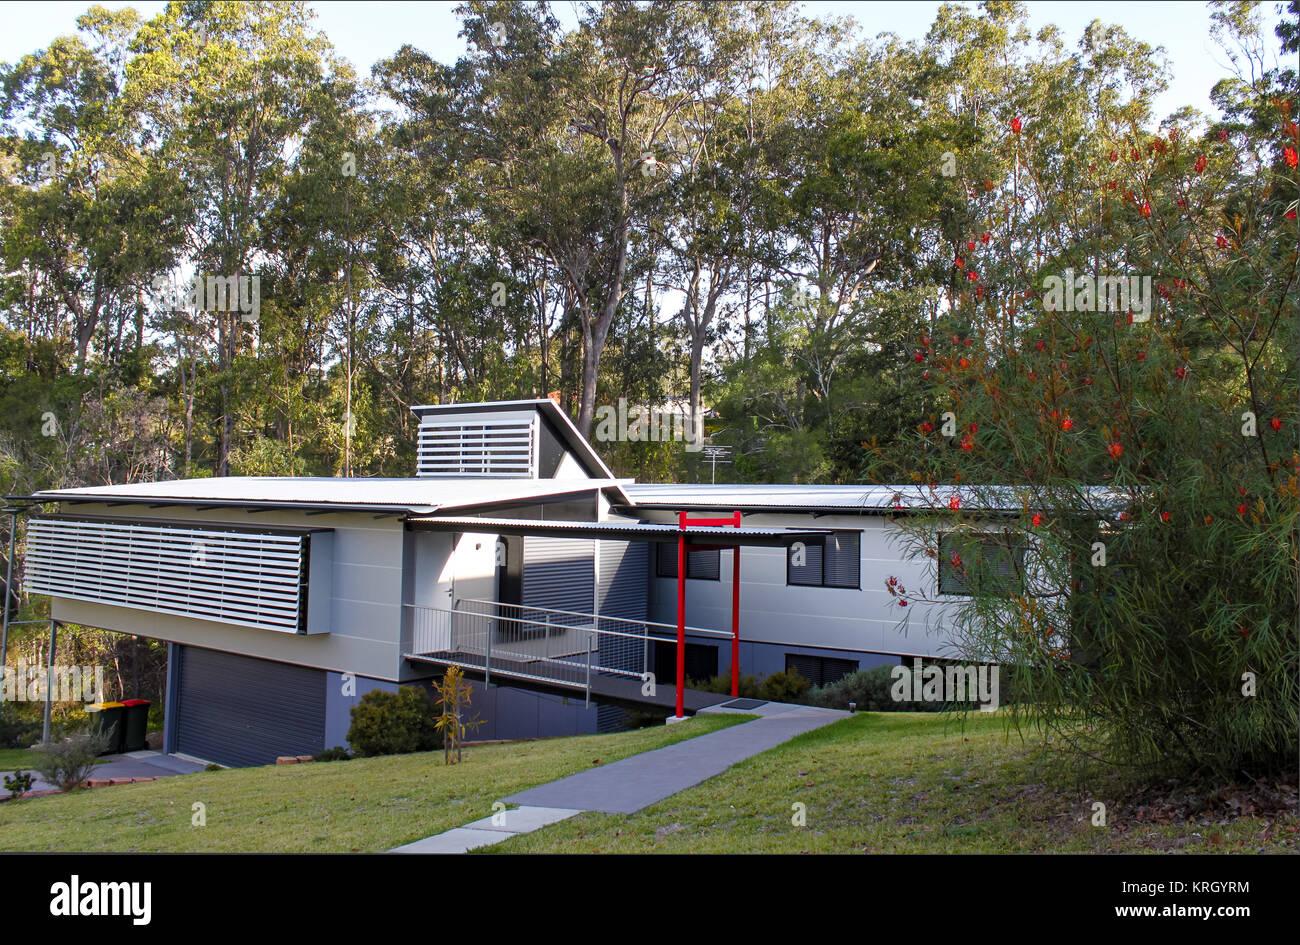 Modern style subtropical suburban home near Brisbane Australia with tall gum trees behind - Stock Image